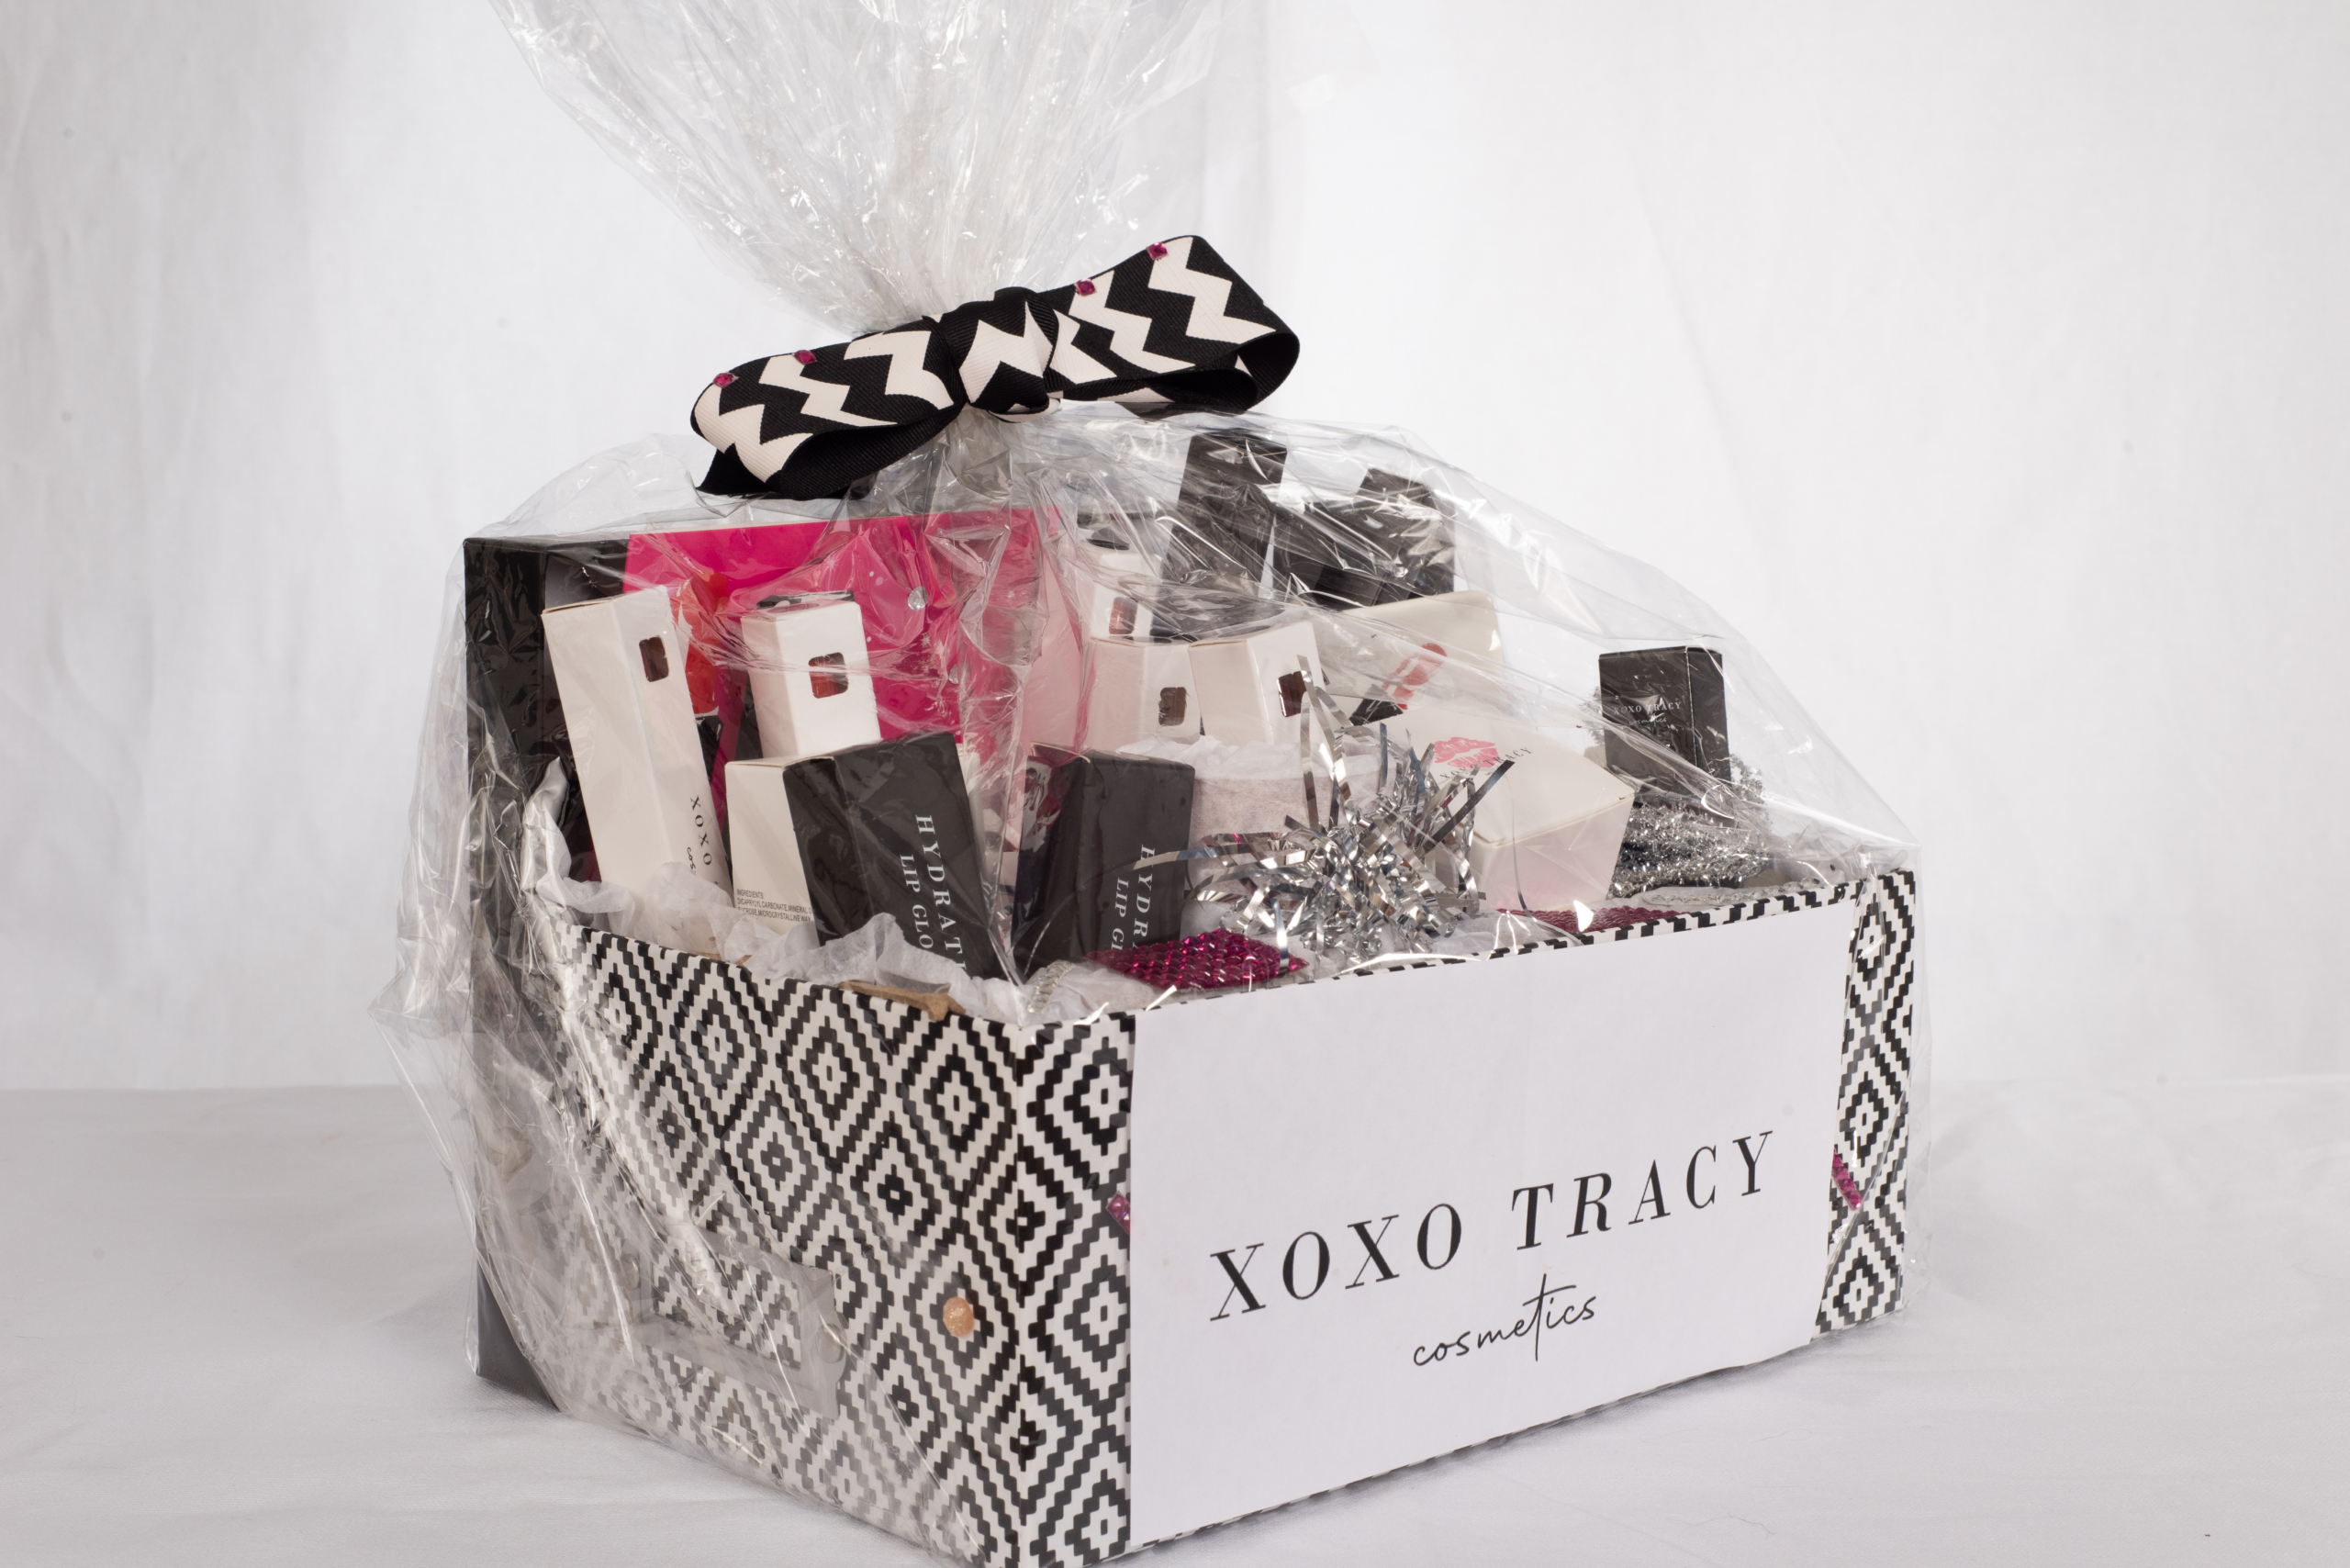 XOXO TRACEY - Cosmetics